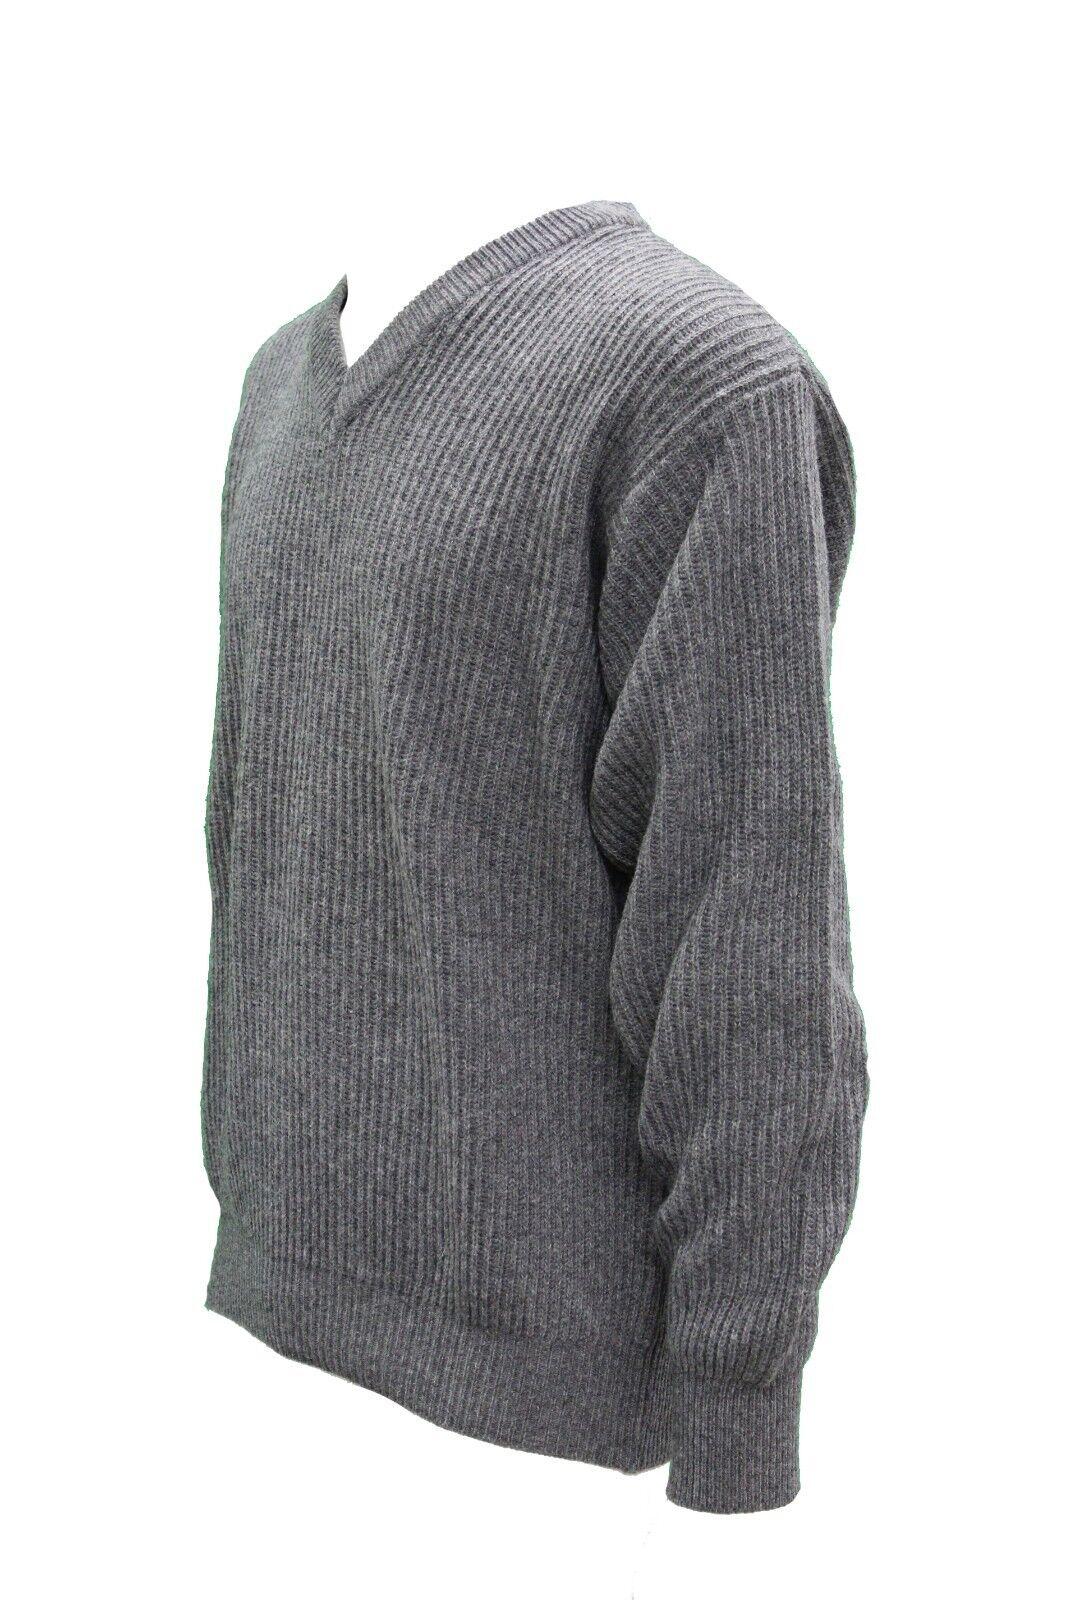 Maglia uomo V 730 manica bordeaux lunga bordeaux manica rombi lana vergine M XL XXL 0375cc